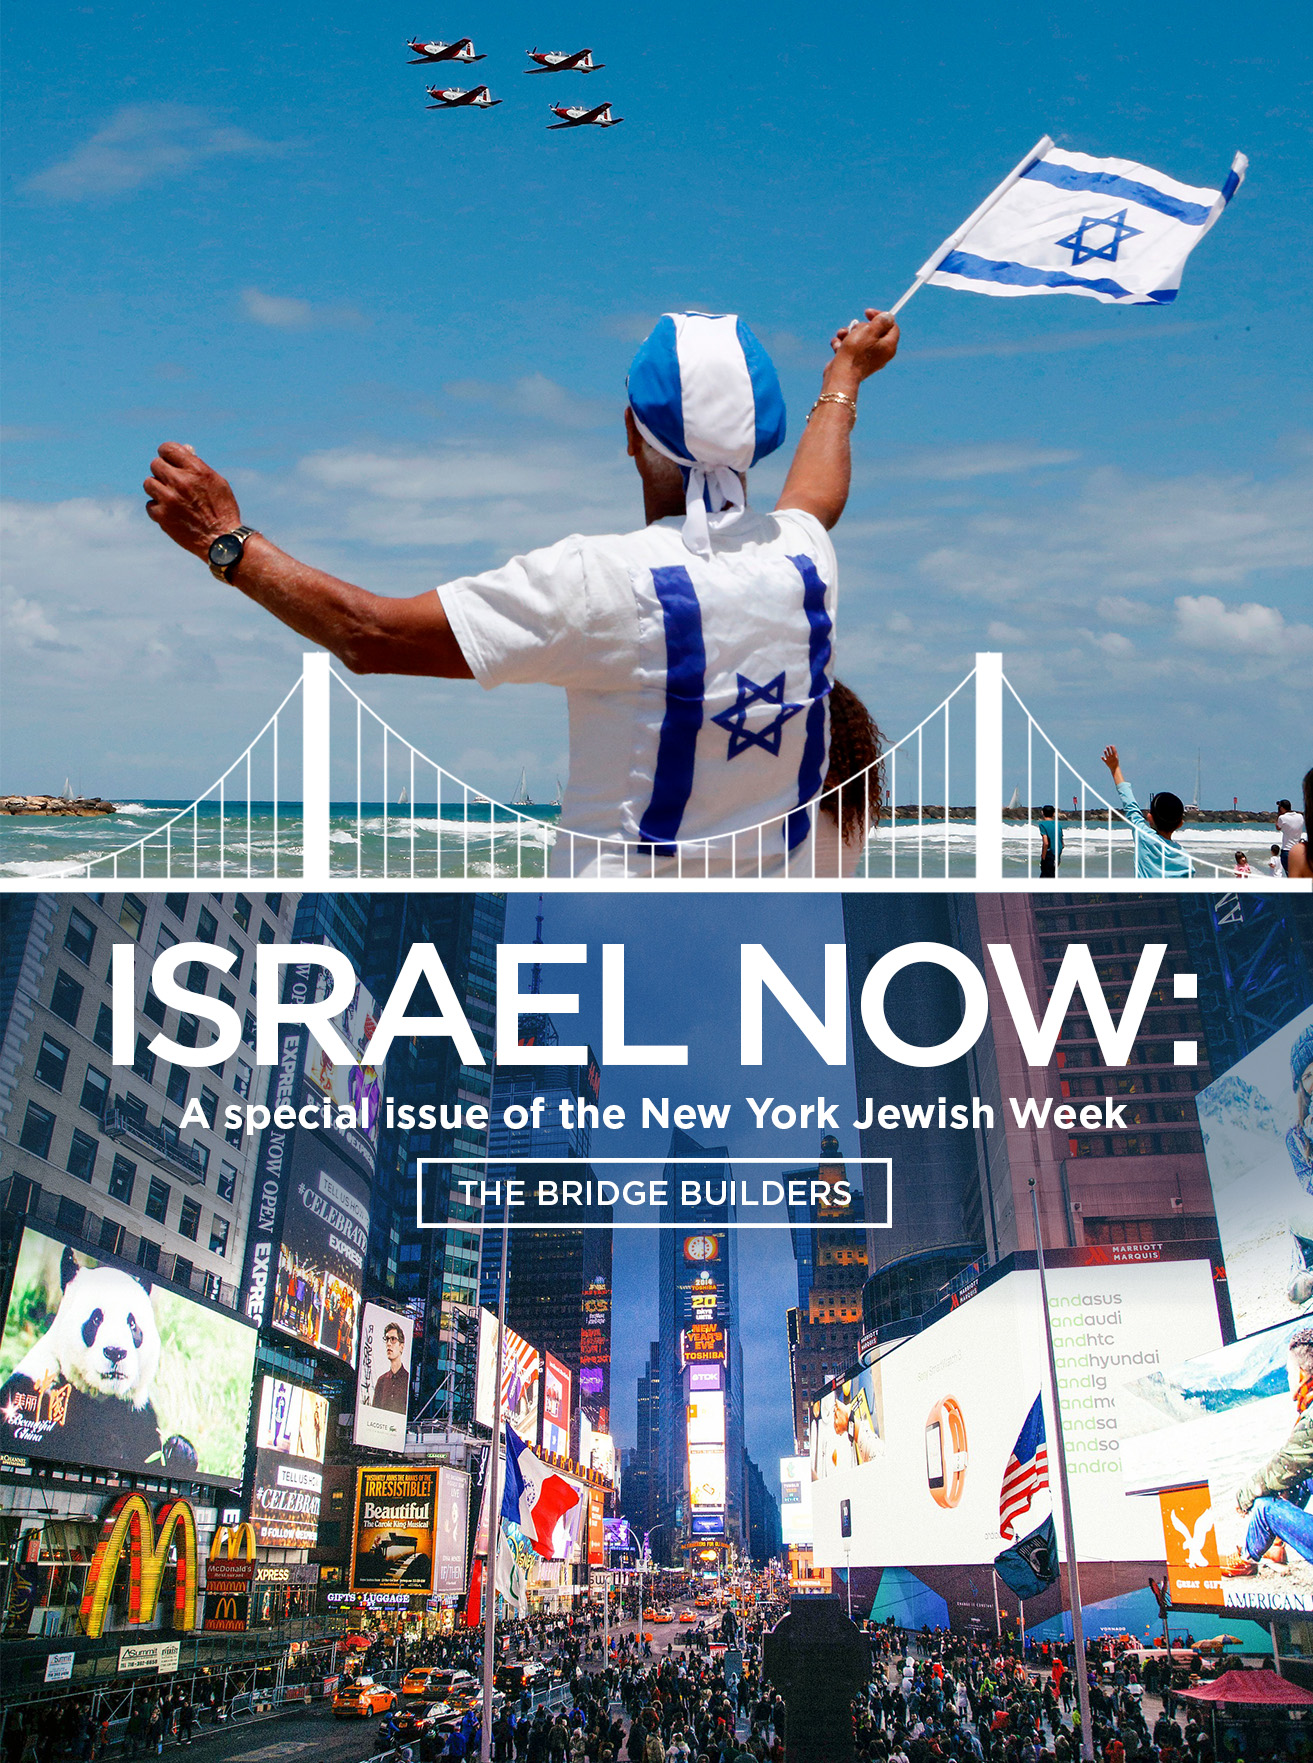 Israel Now May 2019 Jewish Week